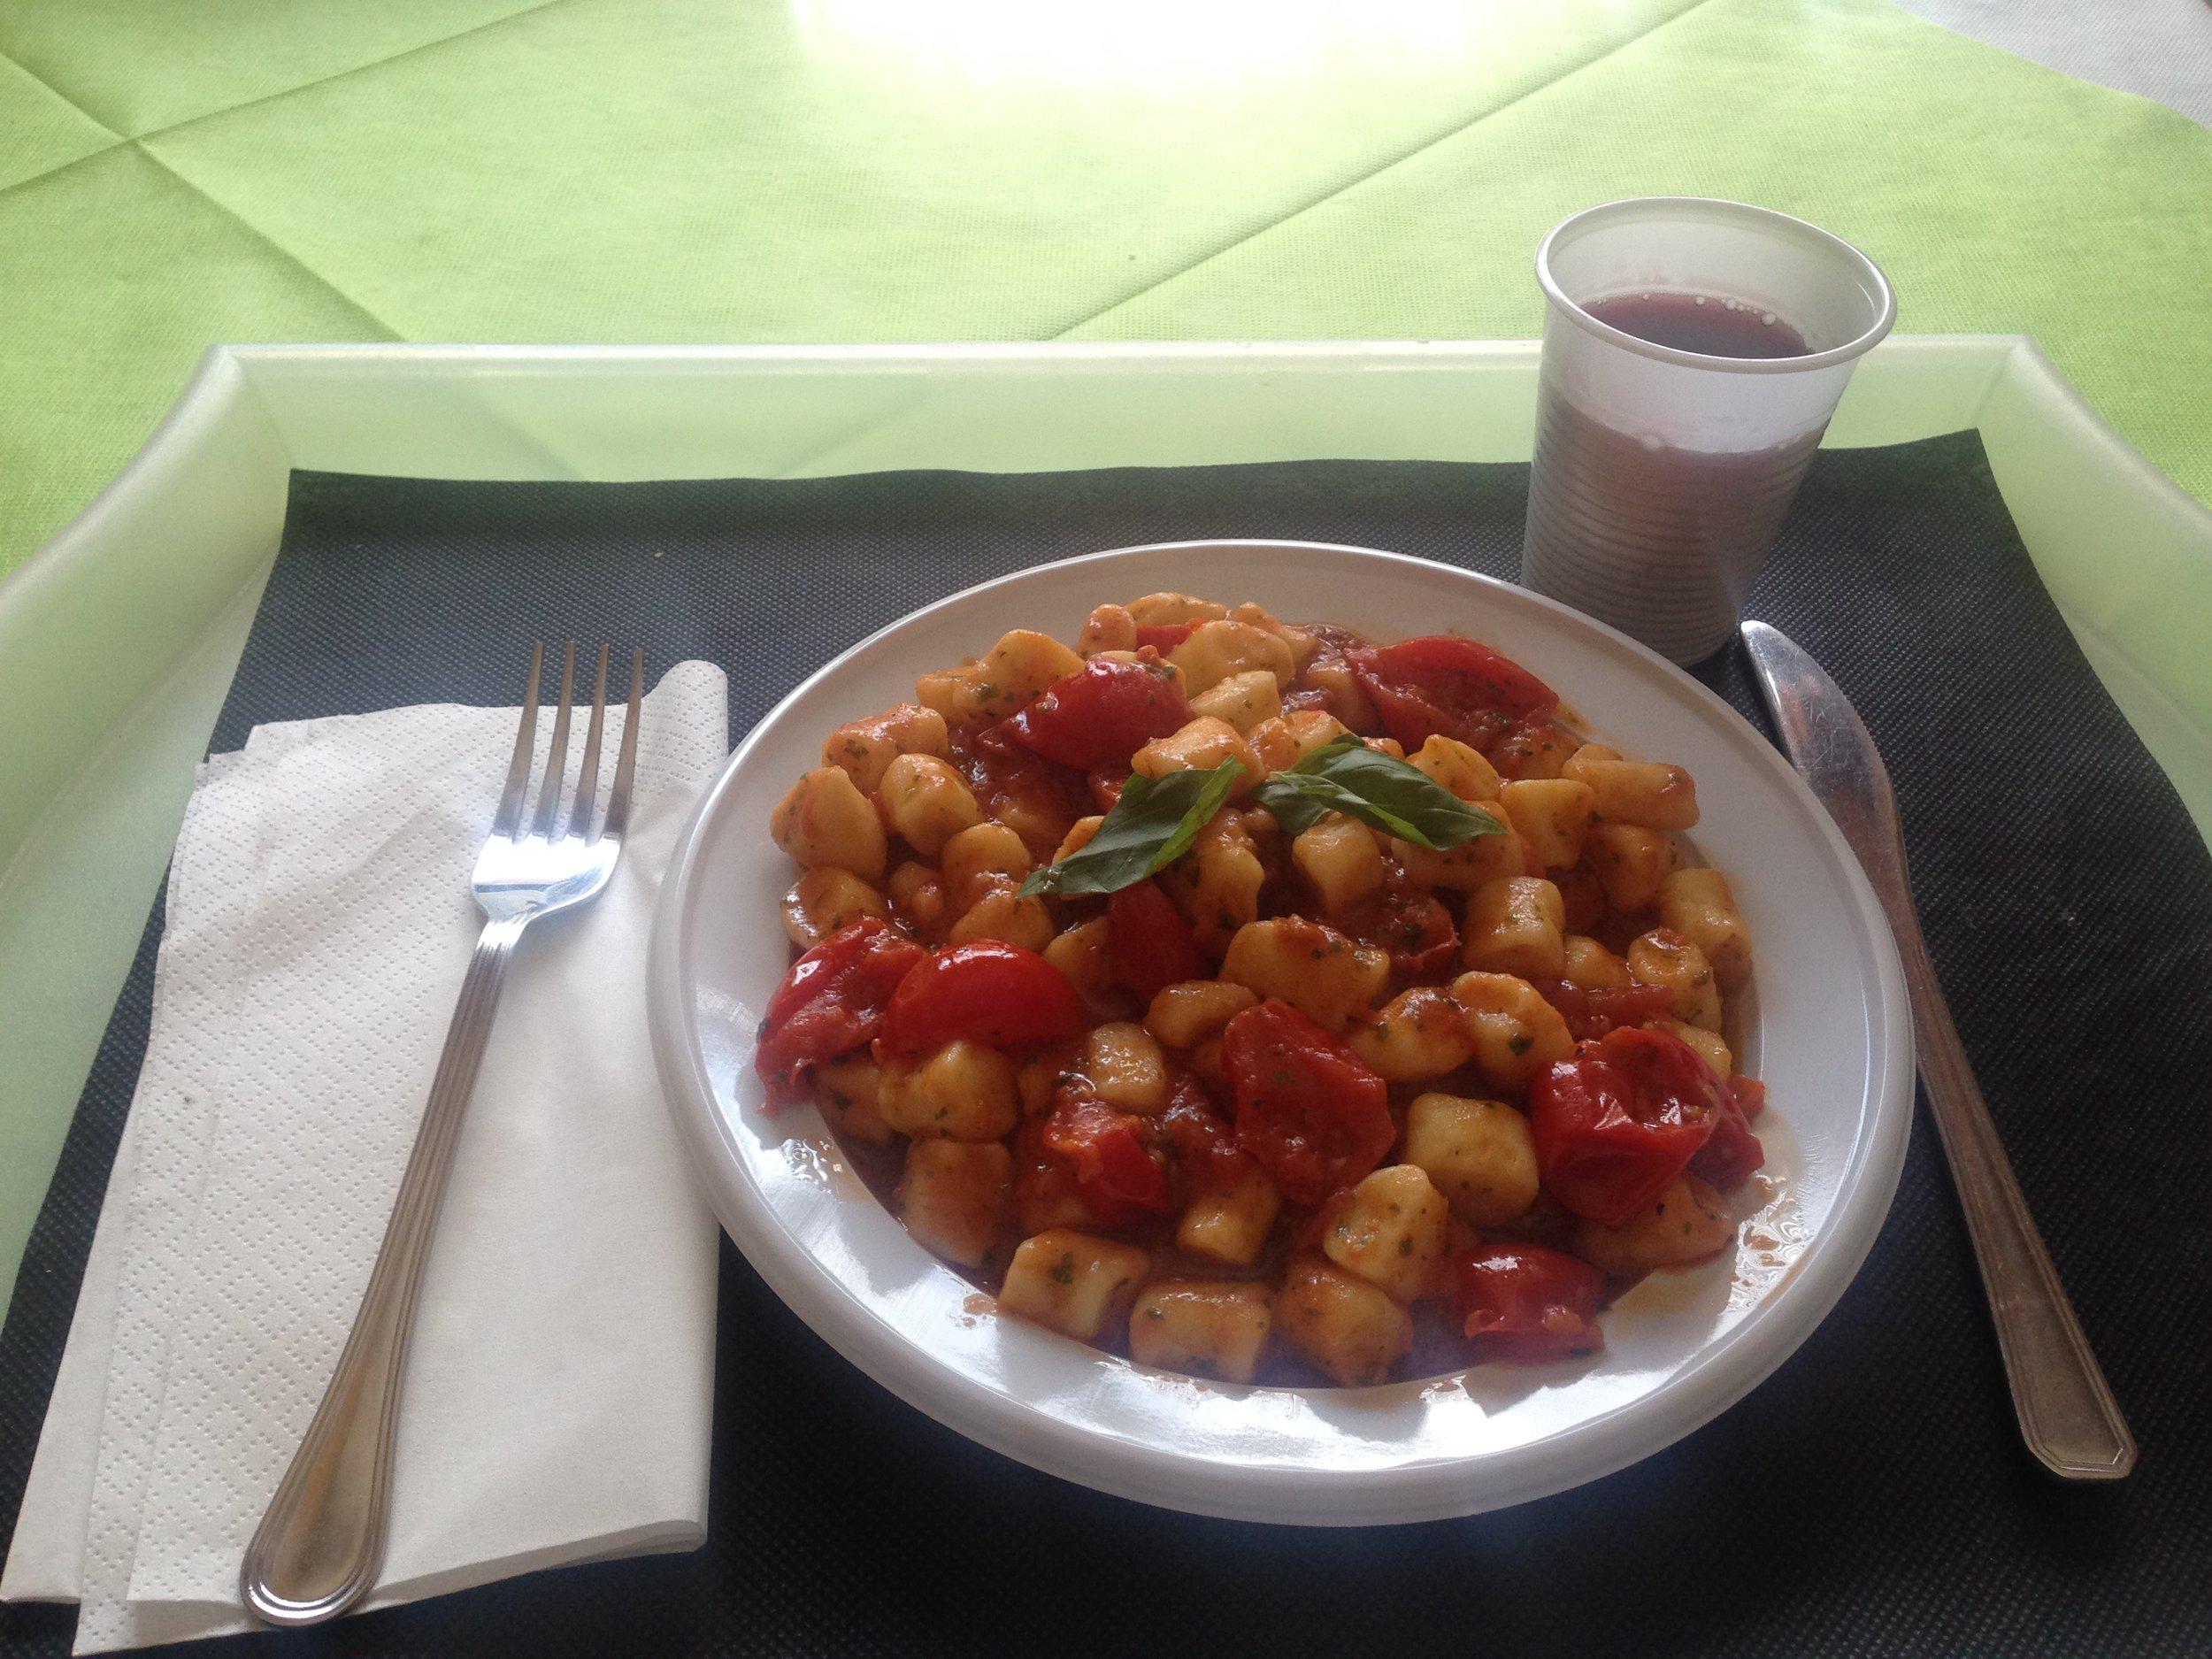 Gnocchi and wine... one of my many divine meals in Civita Castellana!